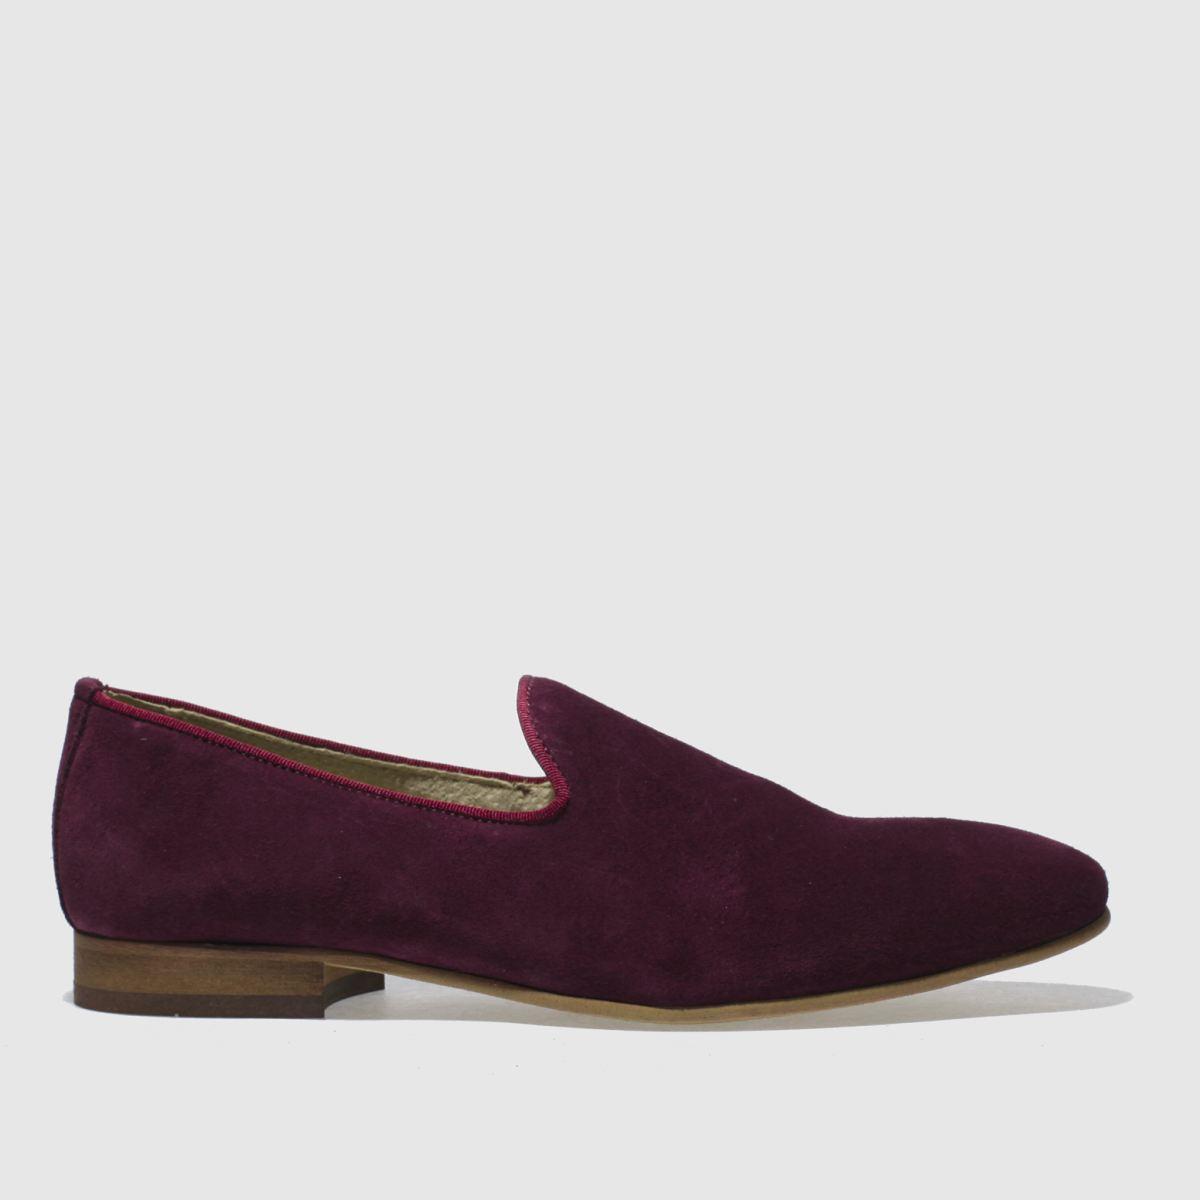 Schuh Burgundy Wicks Slip Shoes